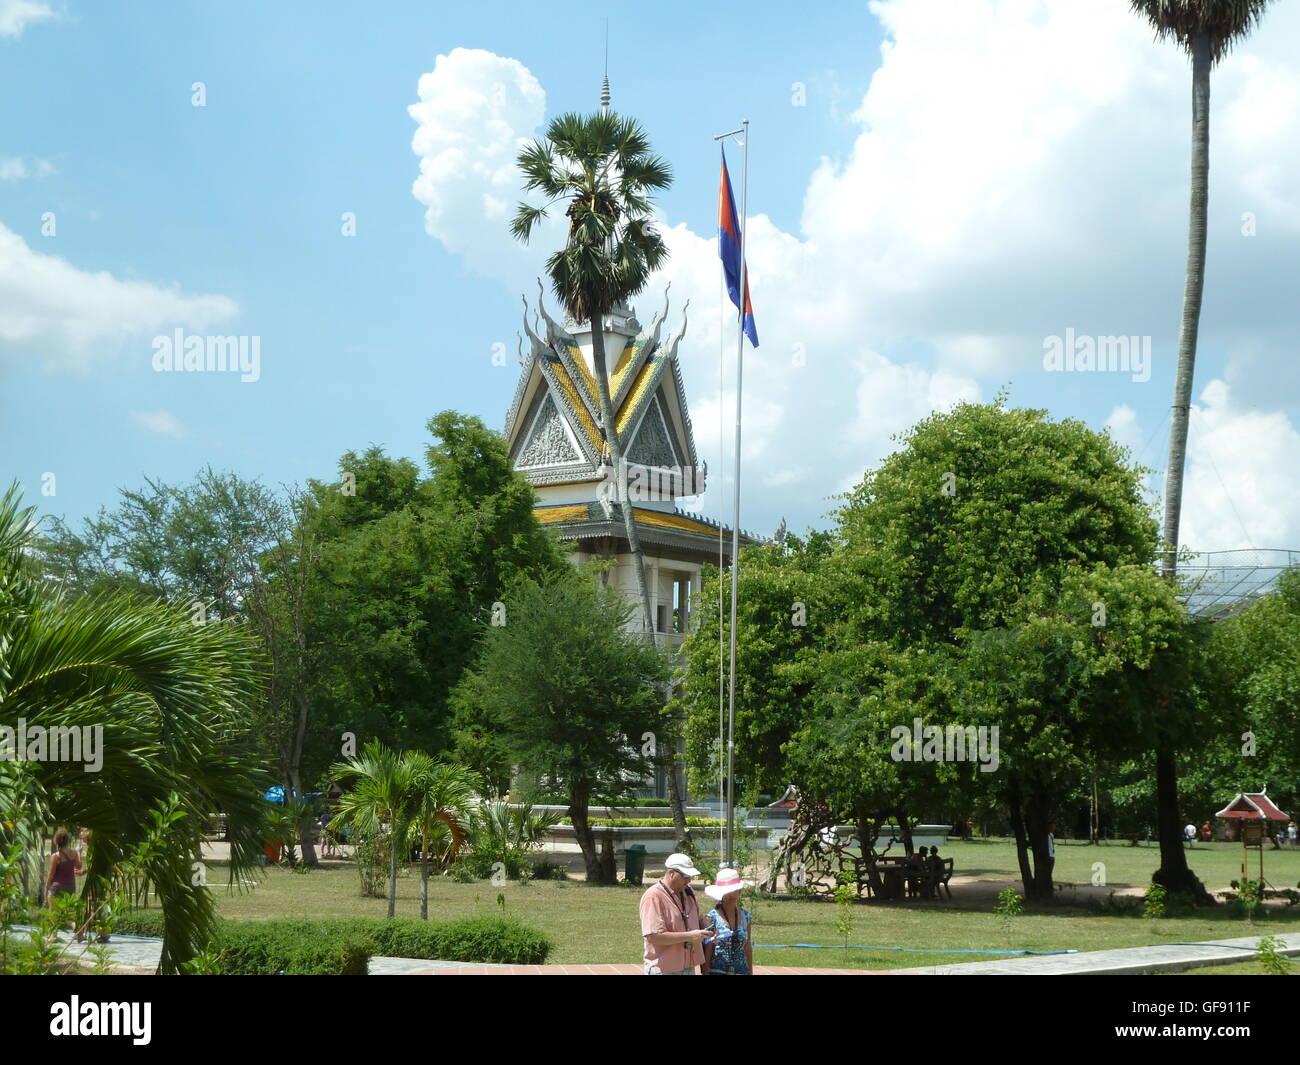 Cambodia, travellers Cambodia, places to visit in Cambodia - Stock Image